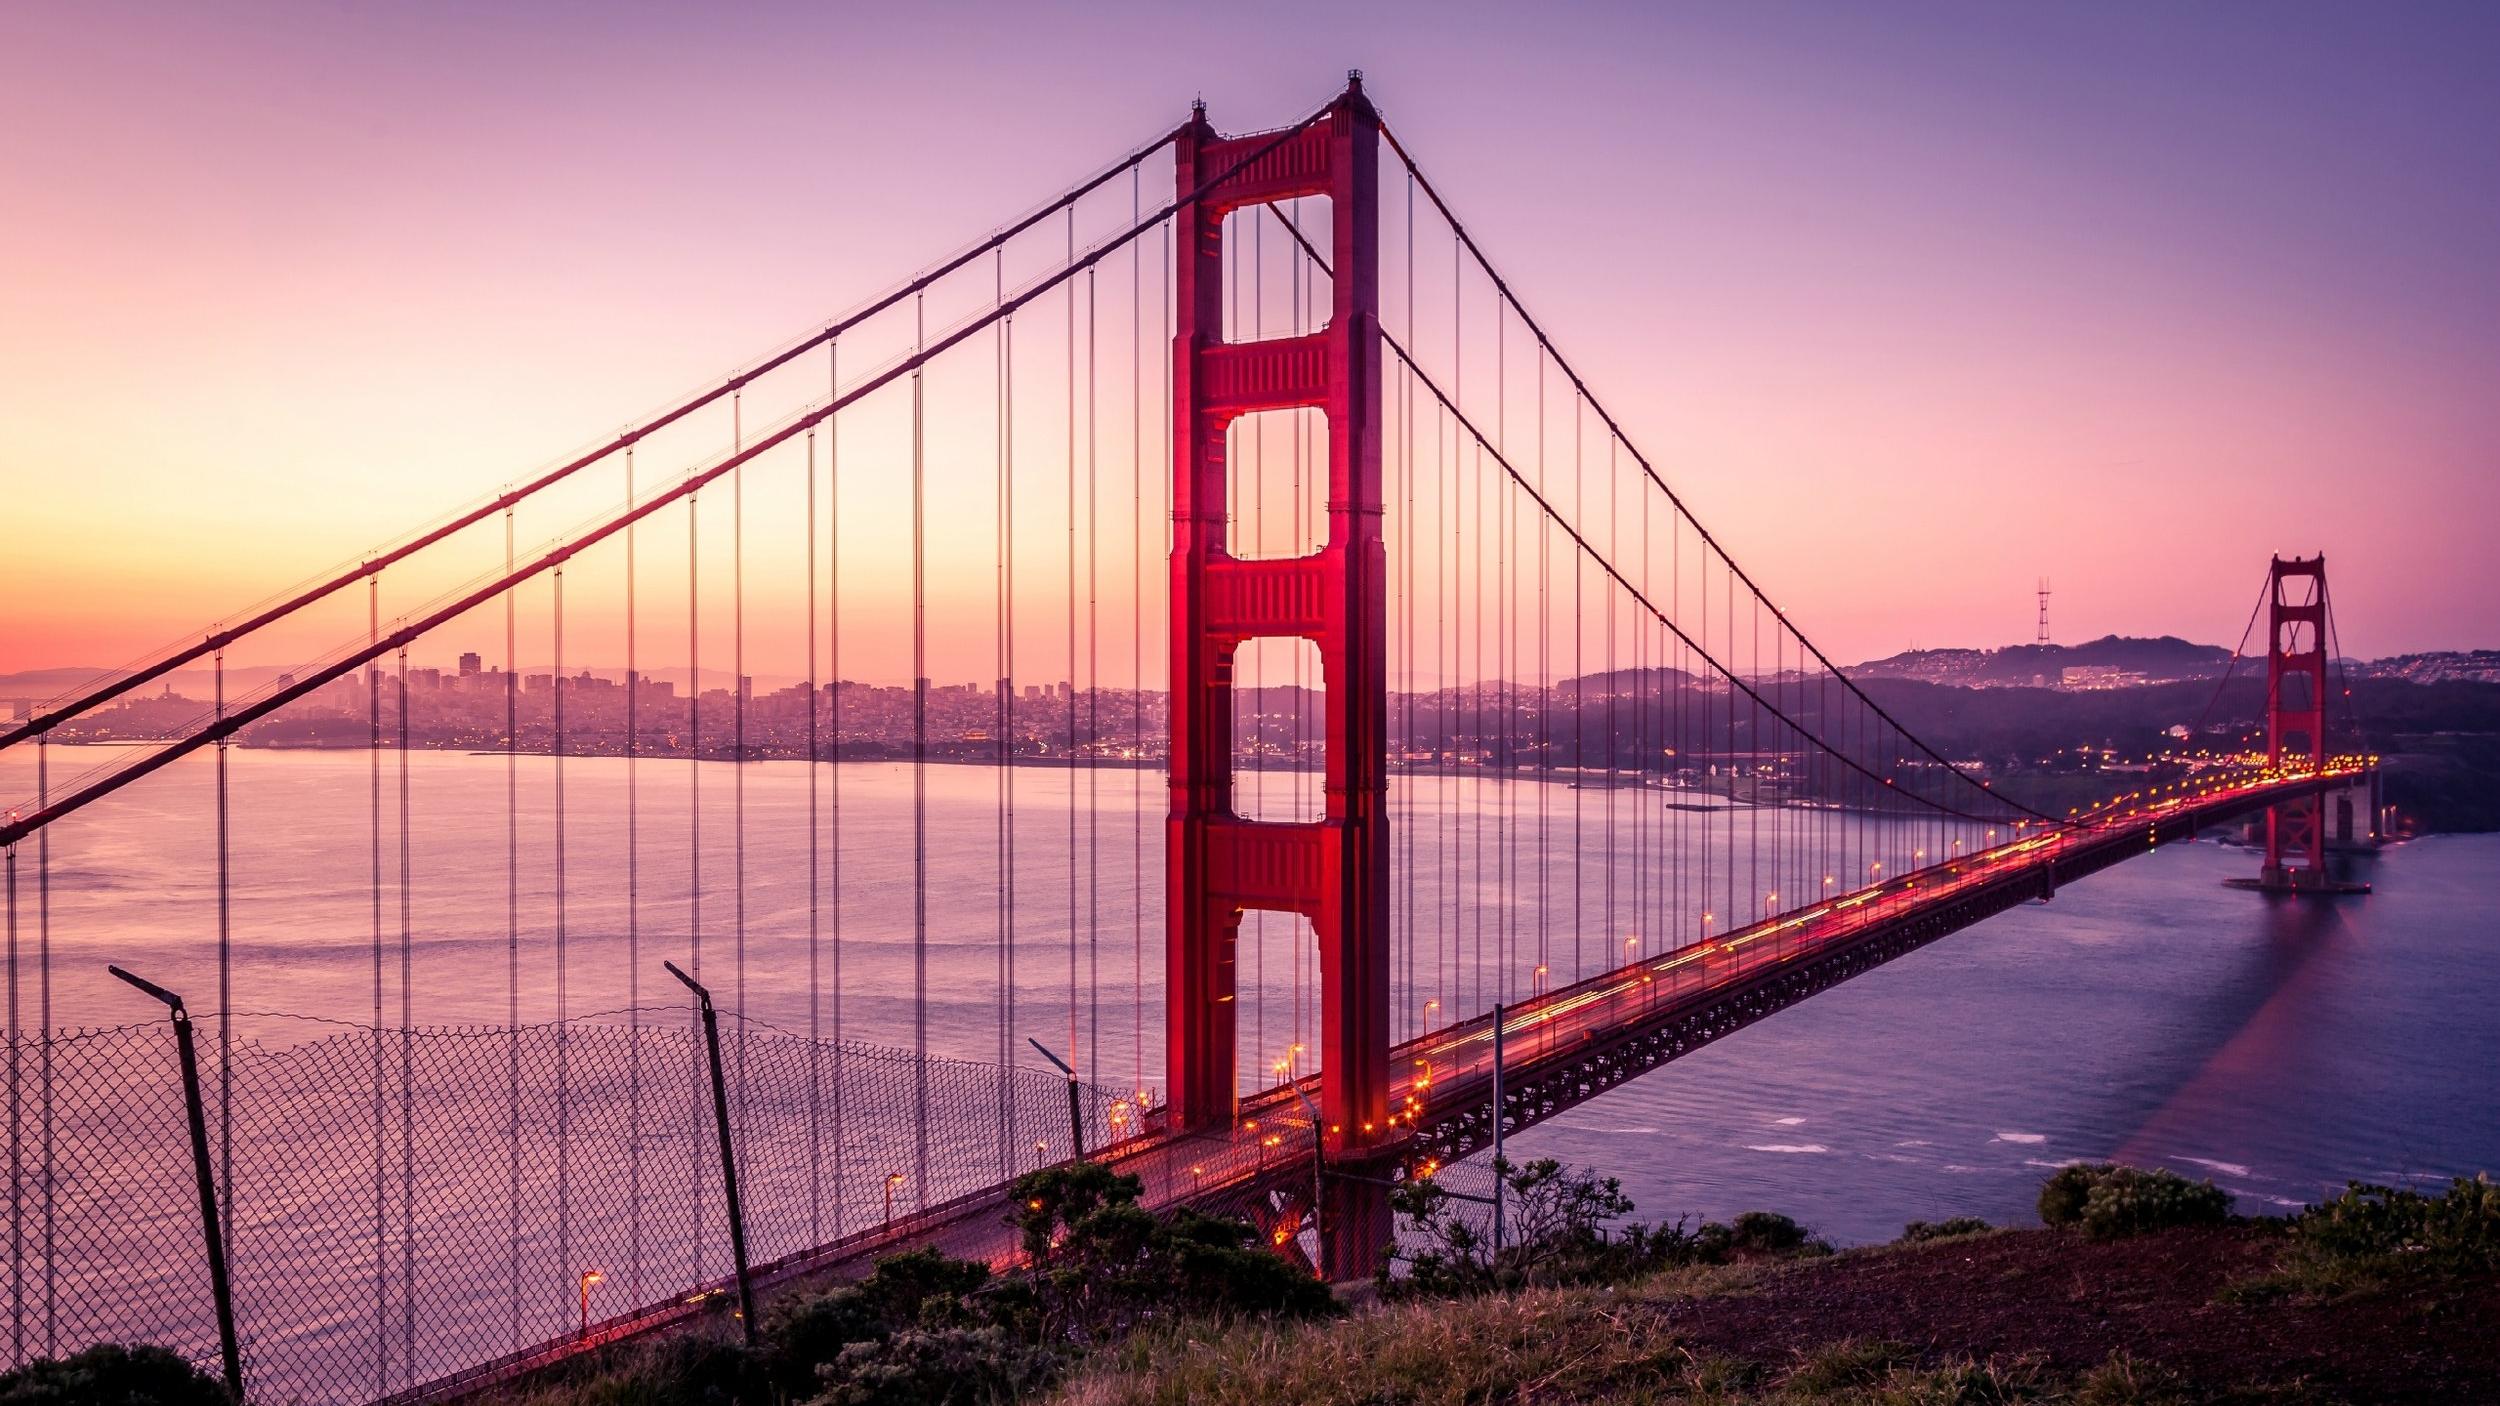 Golden Gate Bridge by Ian Mackey